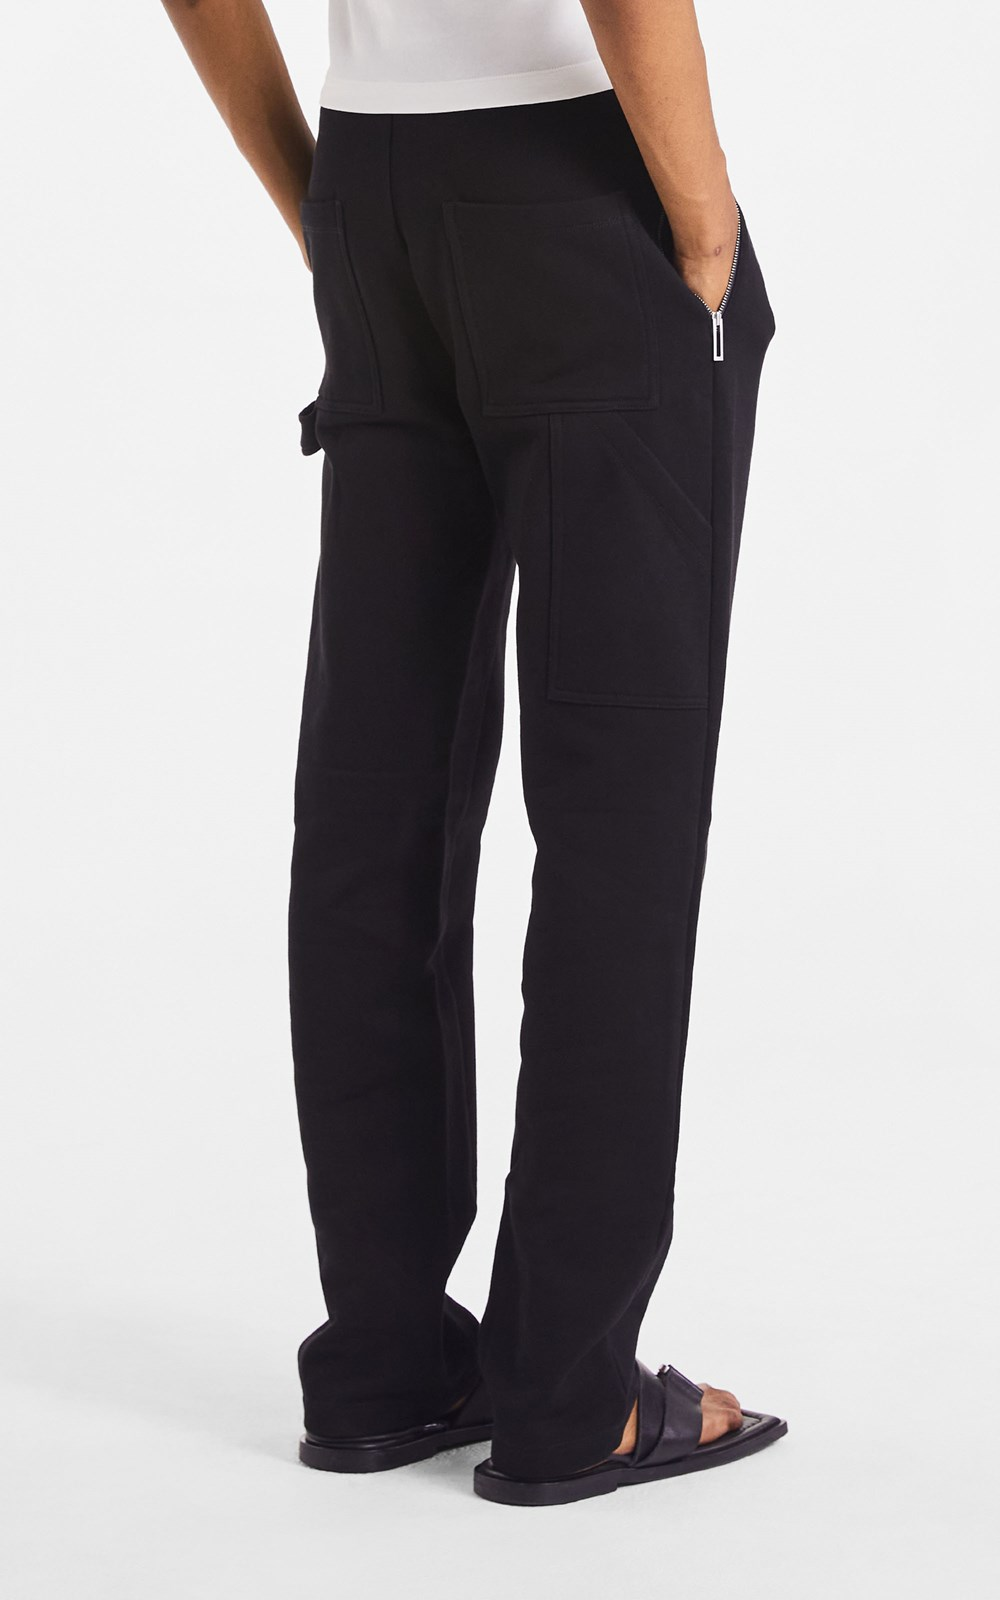 Pants | UTILITY TRACKPANT